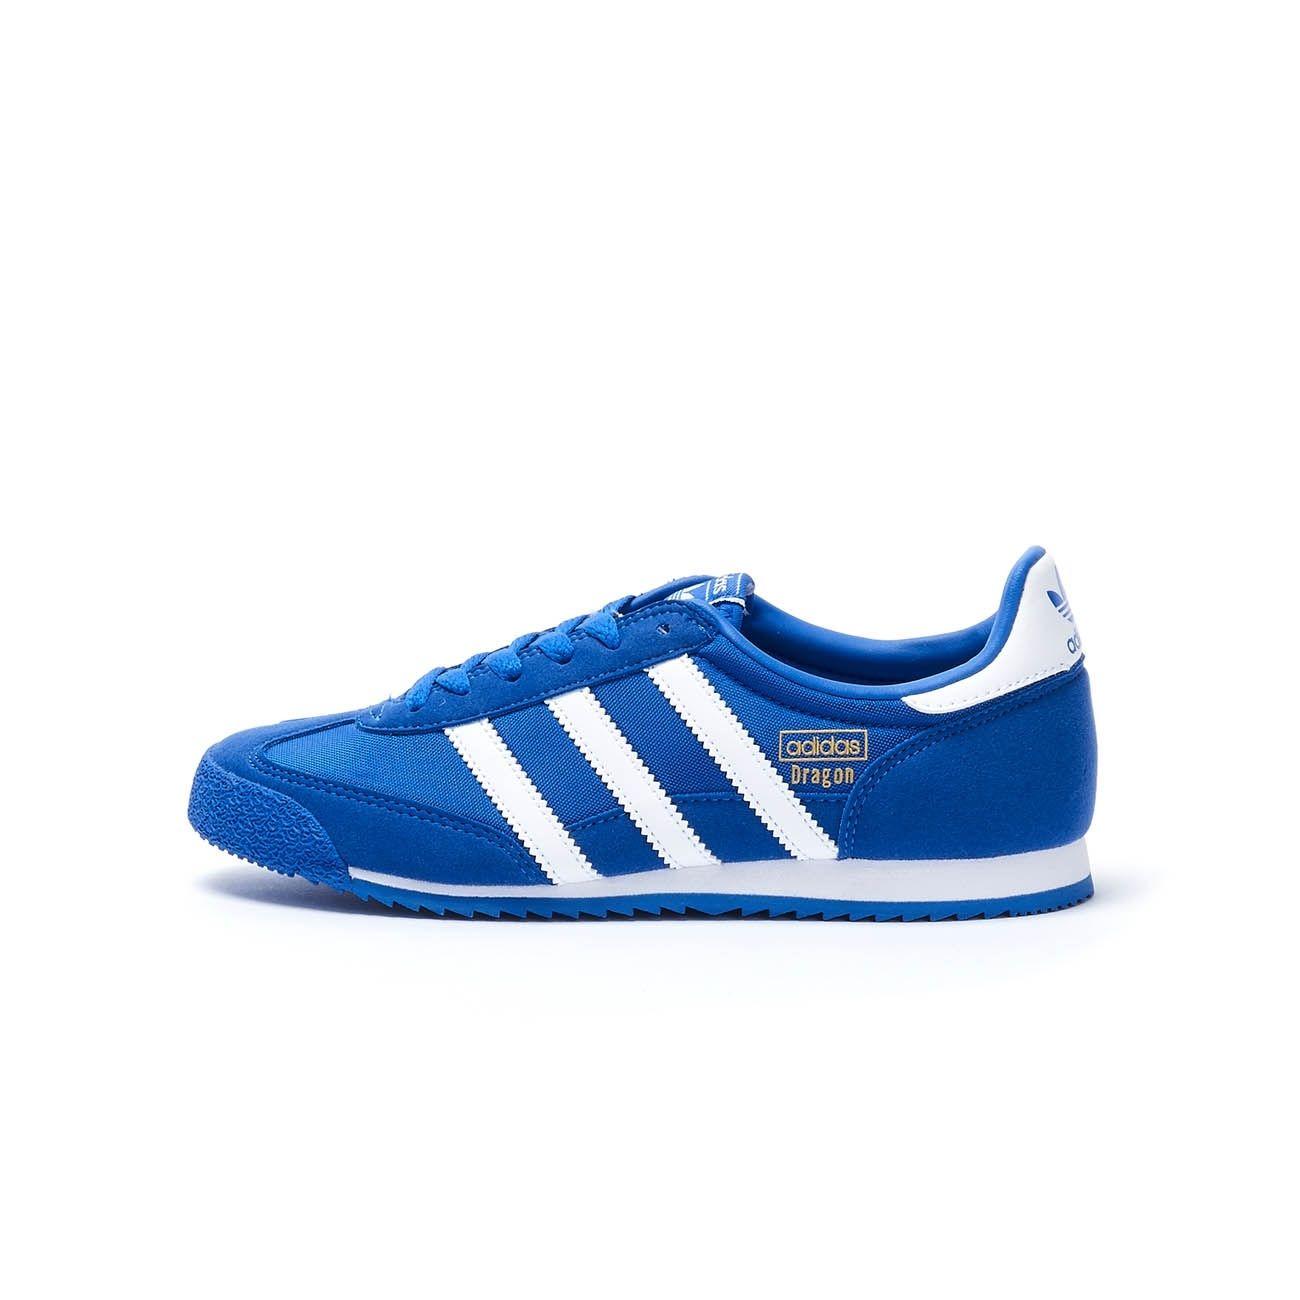 ADIDAS DRAGON OG SNEAKERS Kid Blue white | Mascheroni Sportswear